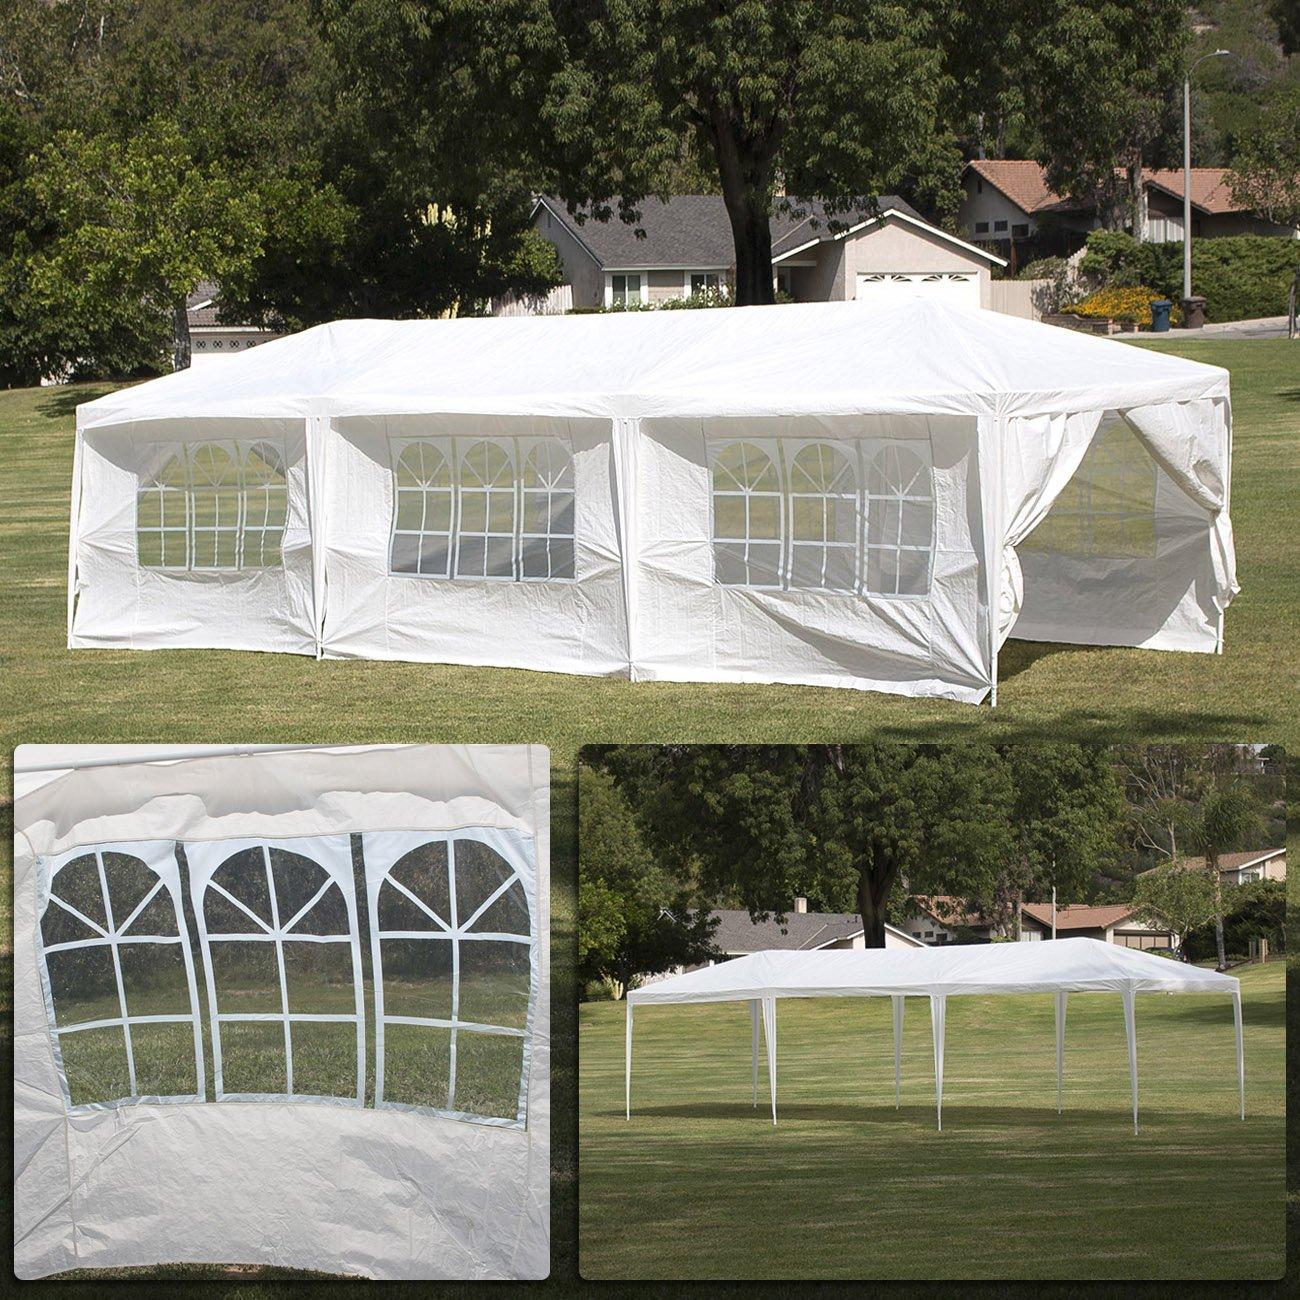 Amazon.com  Belleze 10u0027 x 30u0027 Canopy Party Event Wedding Outdoor Tent Gazebo w/ (8) Removable Side-Wall White  Garden u0026 Outdoor & Amazon.com : Belleze 10u0027 x 30u0027 Canopy Party Event Wedding Outdoor ...